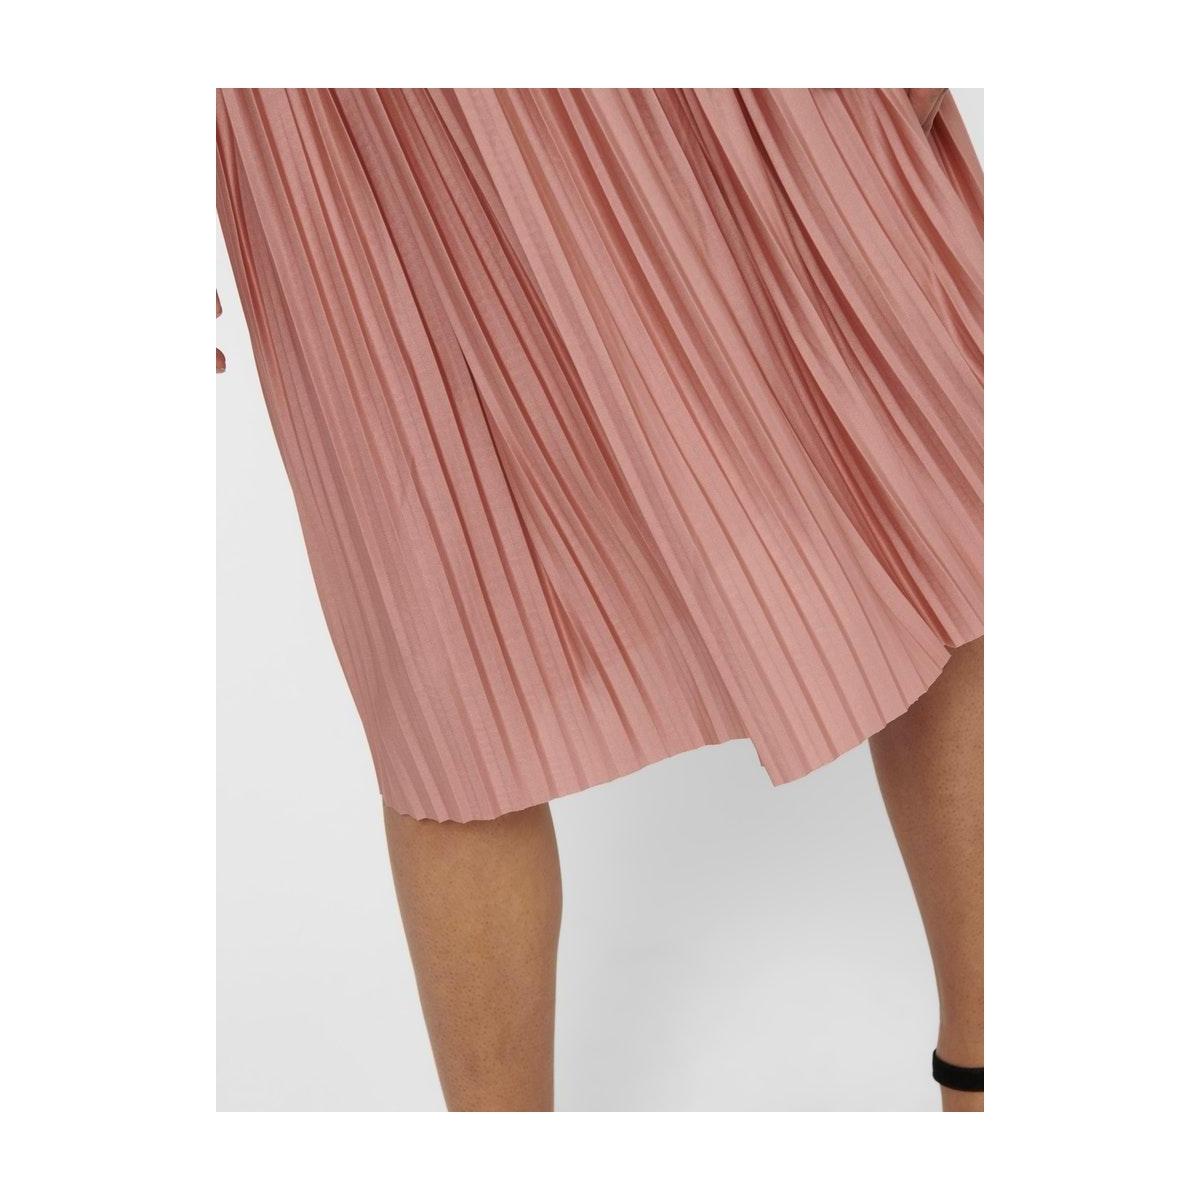 jdyboa skirt jrs rpt 15206814 jacqueline de yong rok old rose